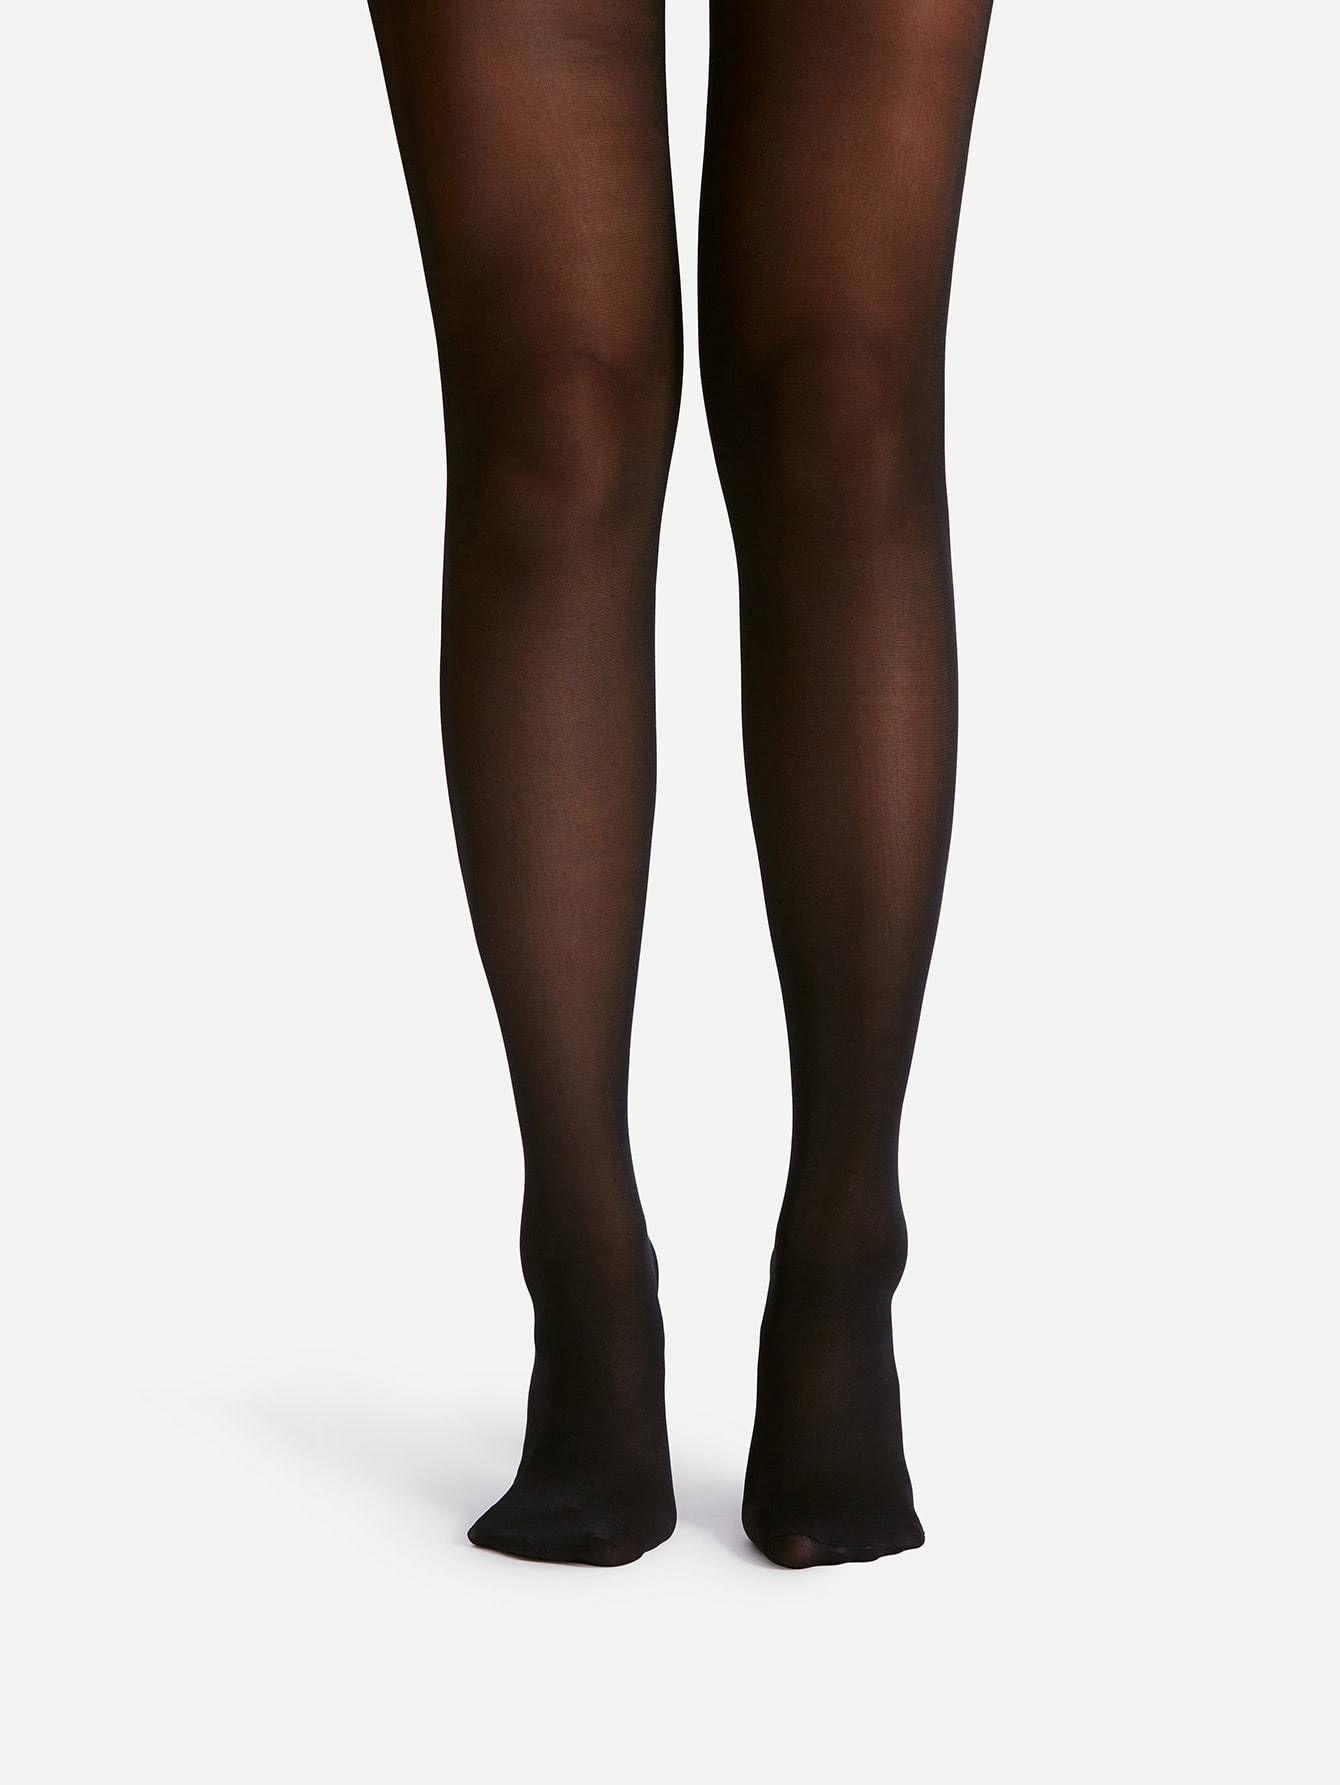 3c735799e0618 40d sheer mesh tights. #sockstights #accessories #women #fashion ...